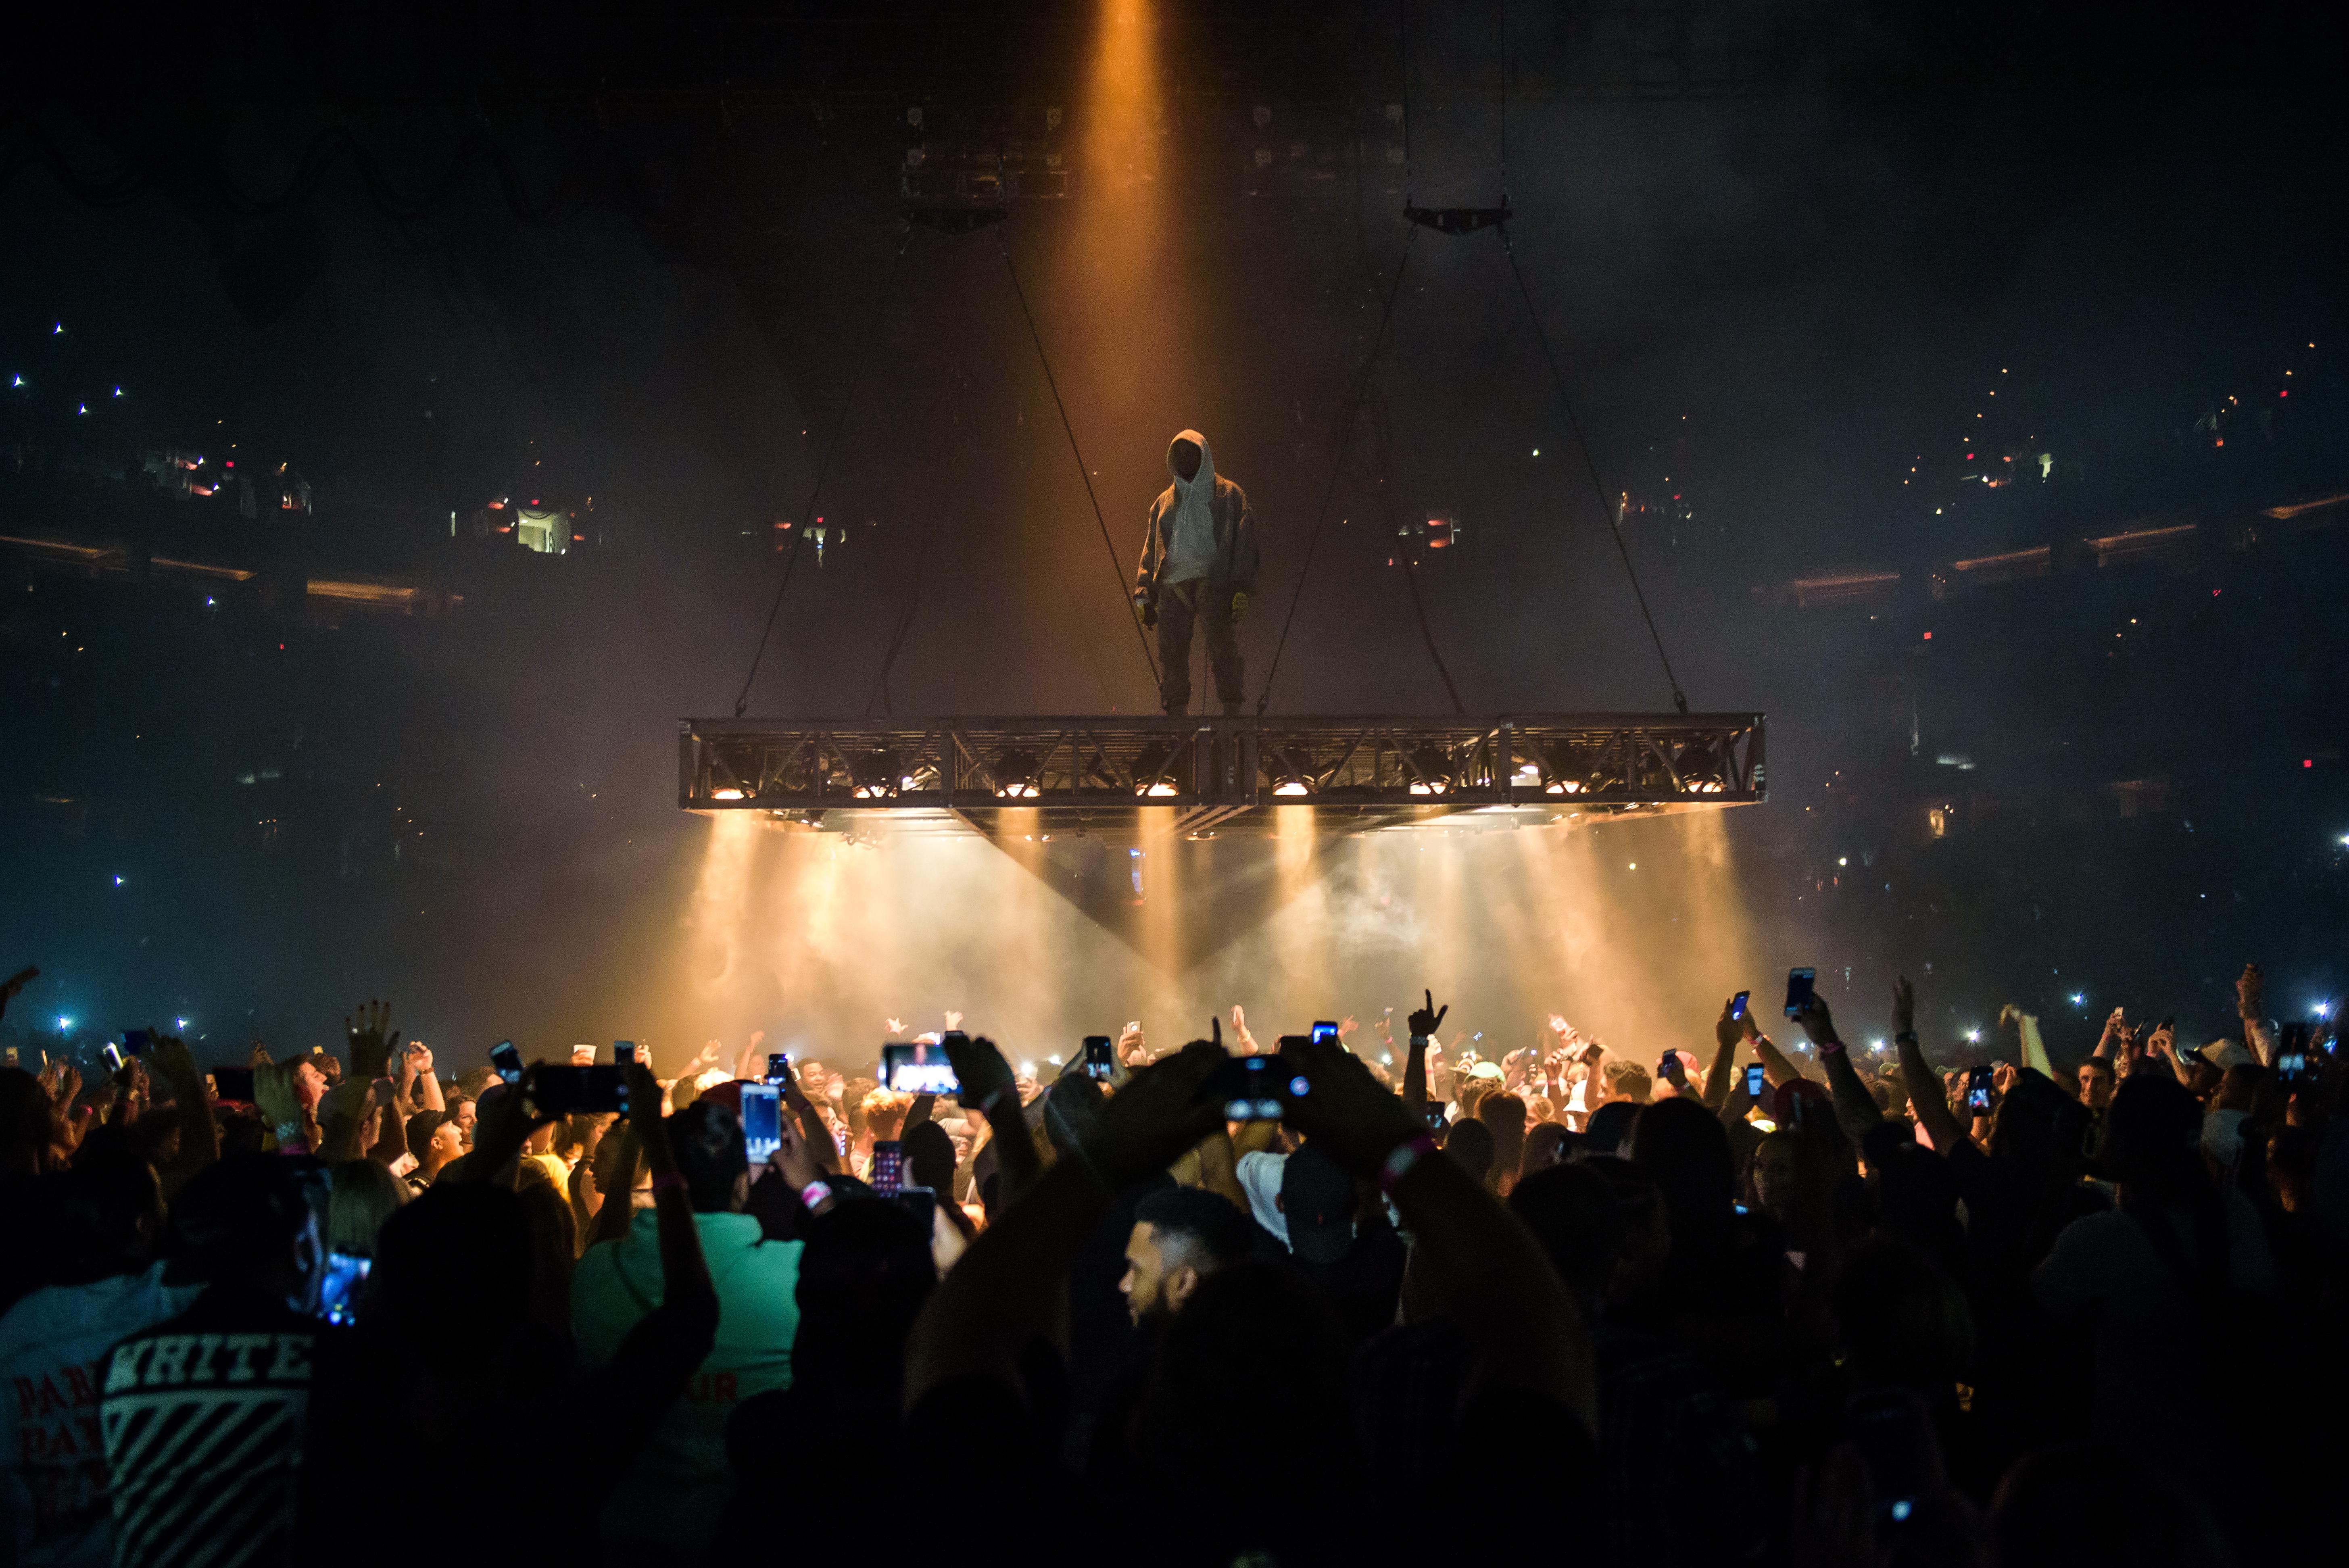 Kanye West Performs in Washington, D.C. on the Saint Pablo Tour